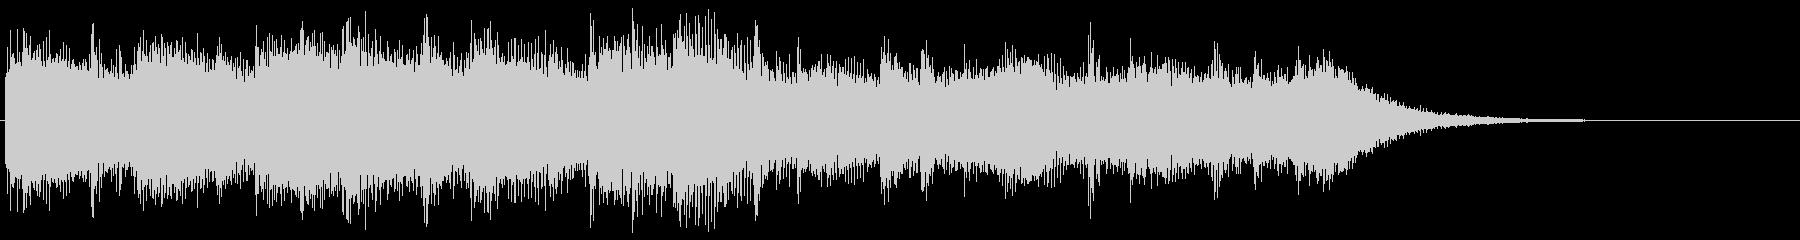 8bitなエンディング ほのぼの場面転換の未再生の波形